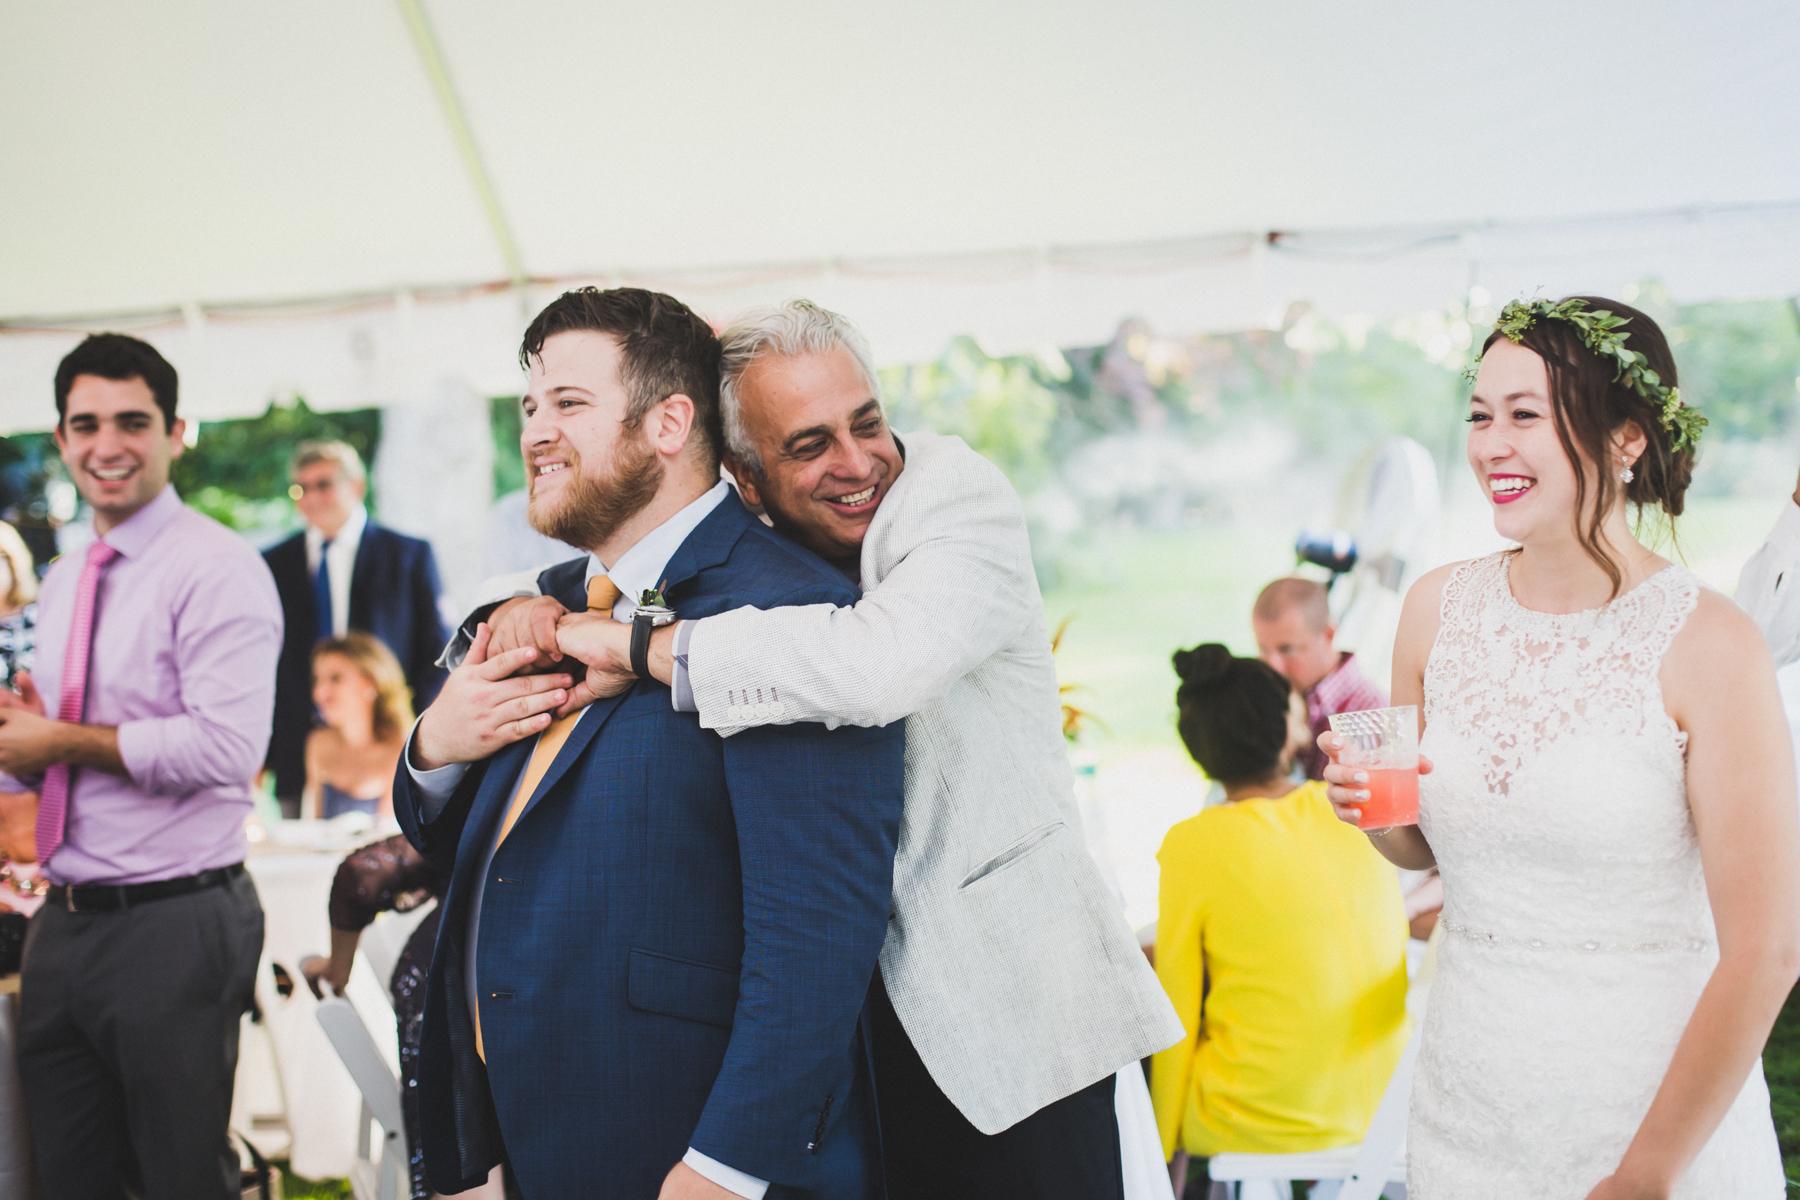 Long-Island-Documentary-Wedding-Photography-Summer-Tent-Wedding-in-New-York-128.jpg